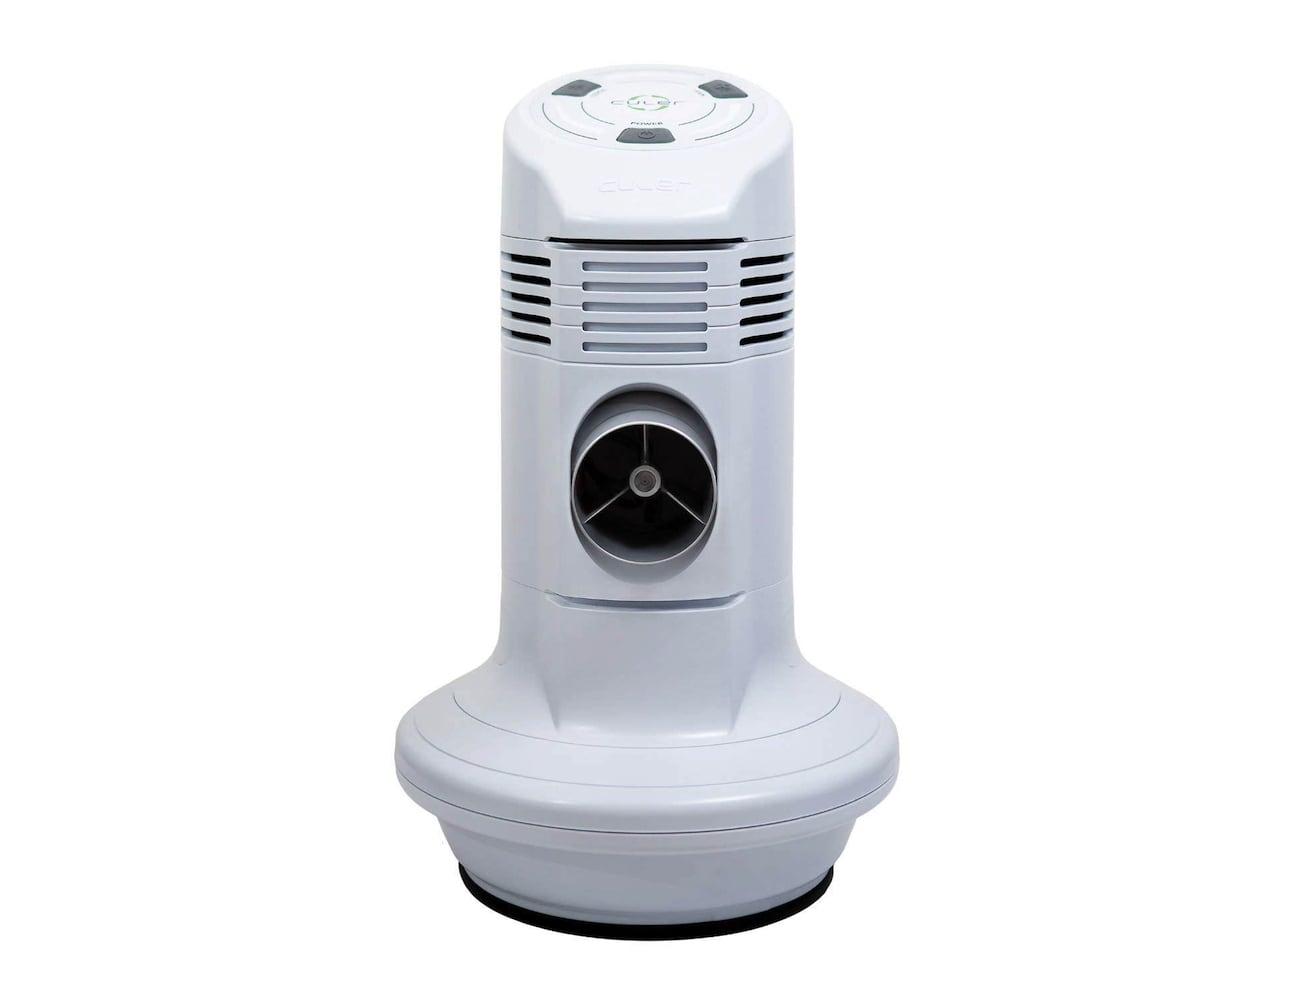 Culer SOLO Flash-Evaporative Air Cooler